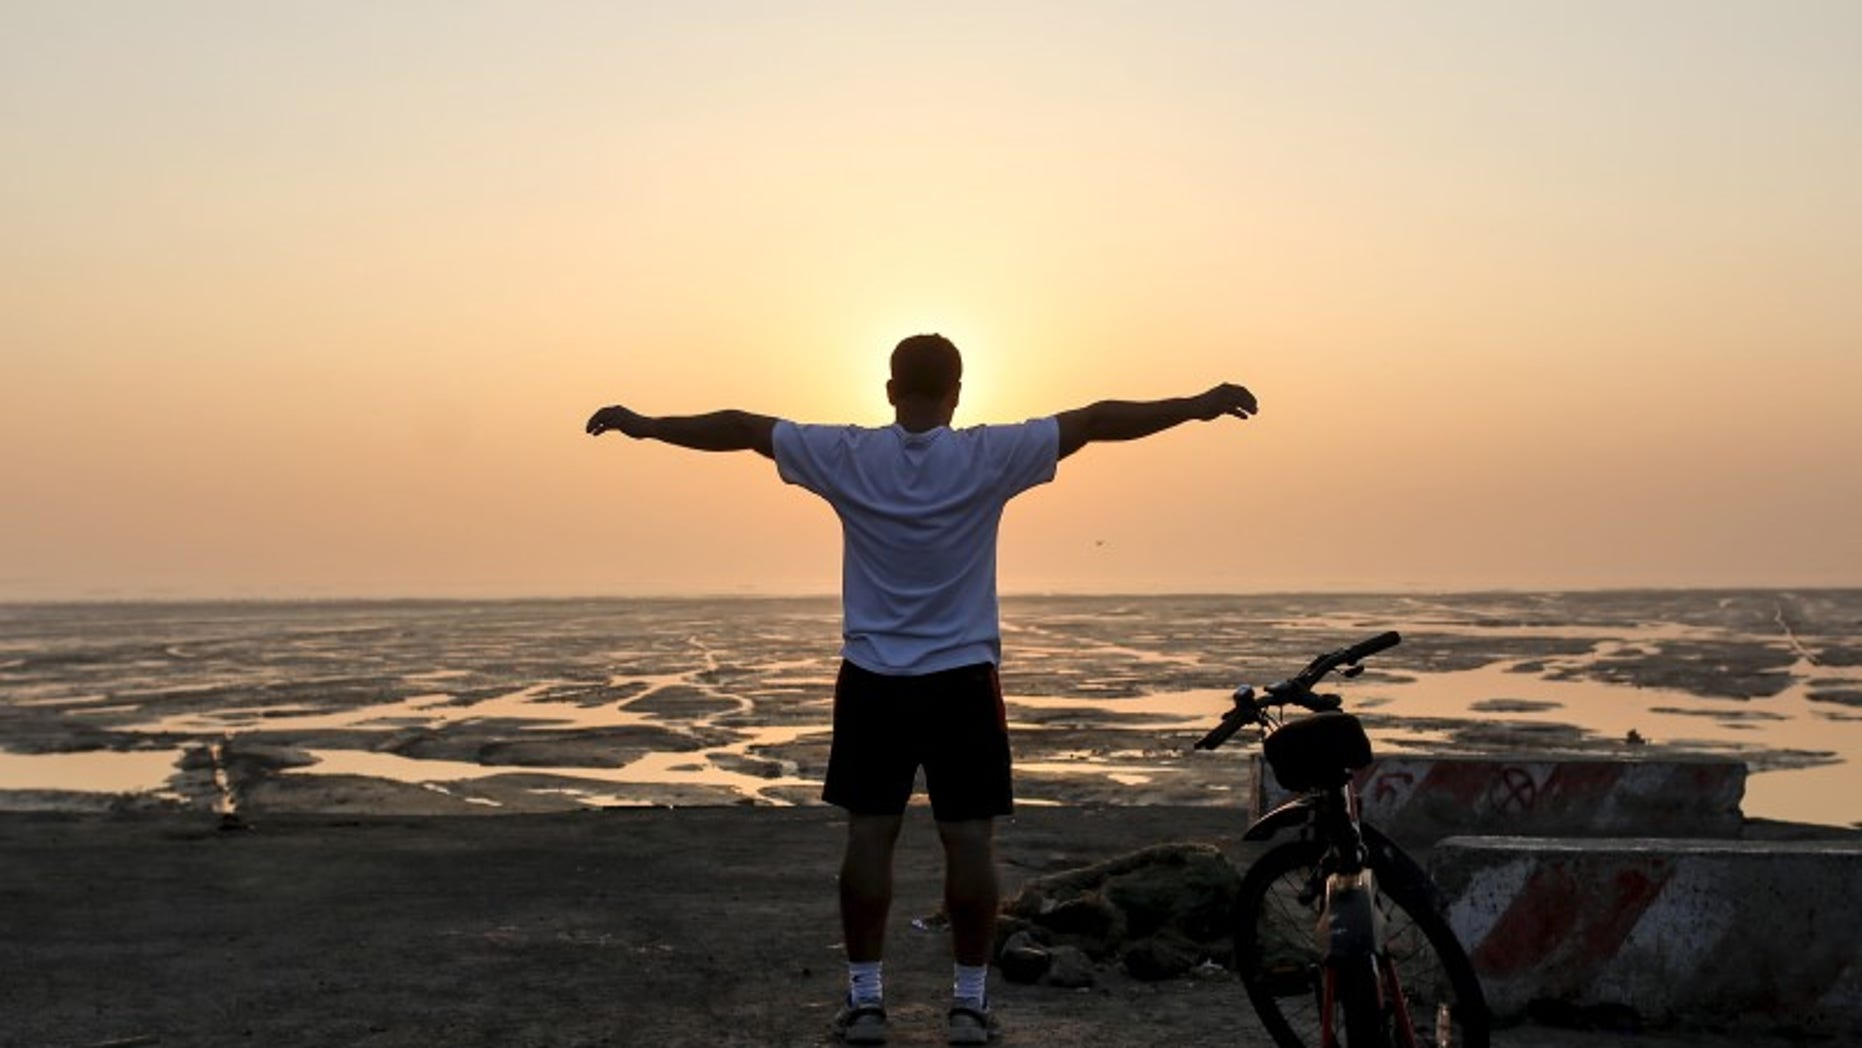 A man exercises early morning along the Arabian Sea in Mumbai